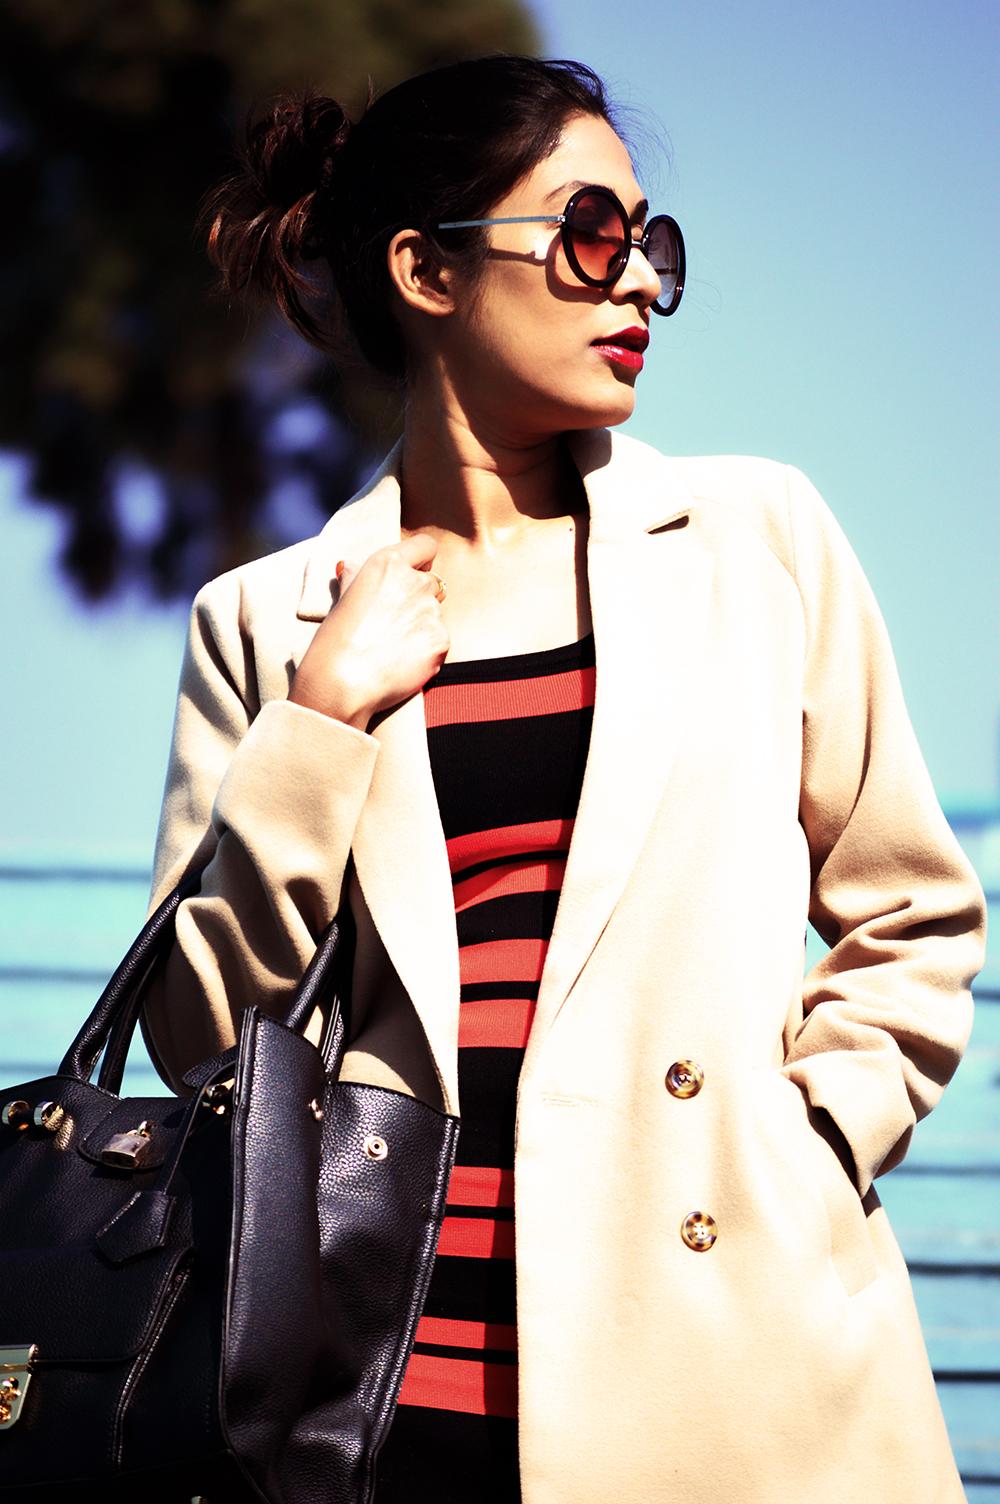 sarmistha style ovr coffee fashion1